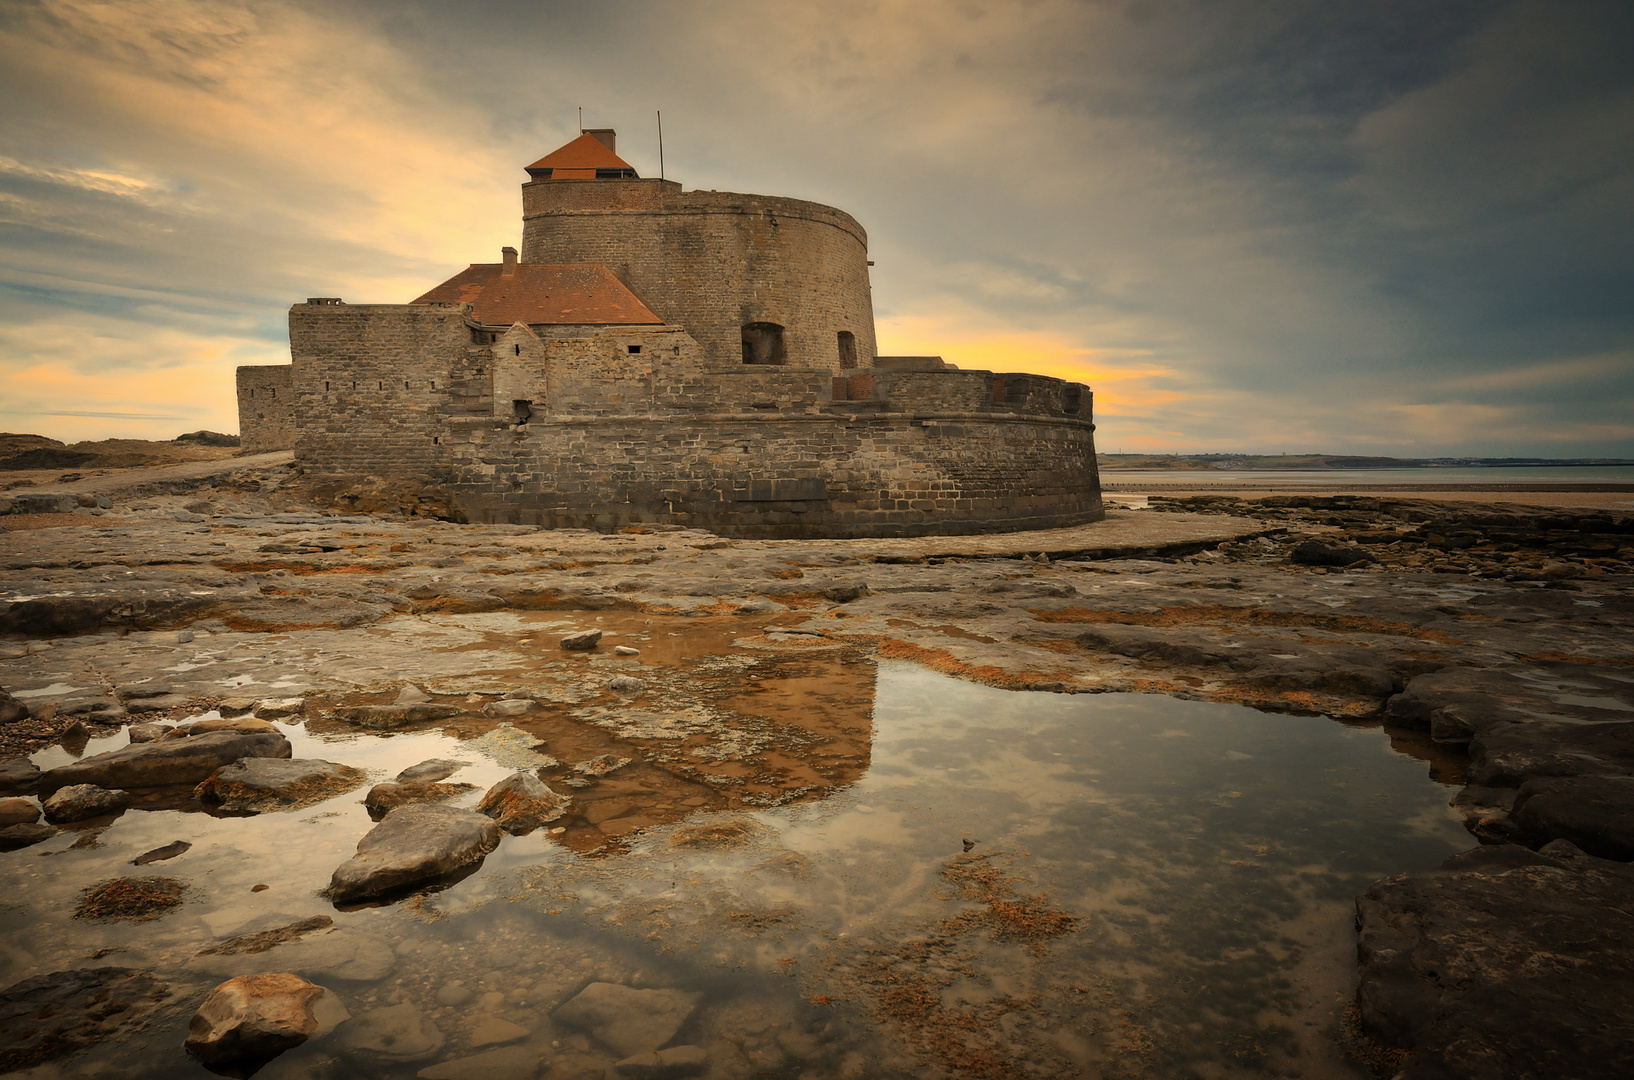 Le Fort Mahon